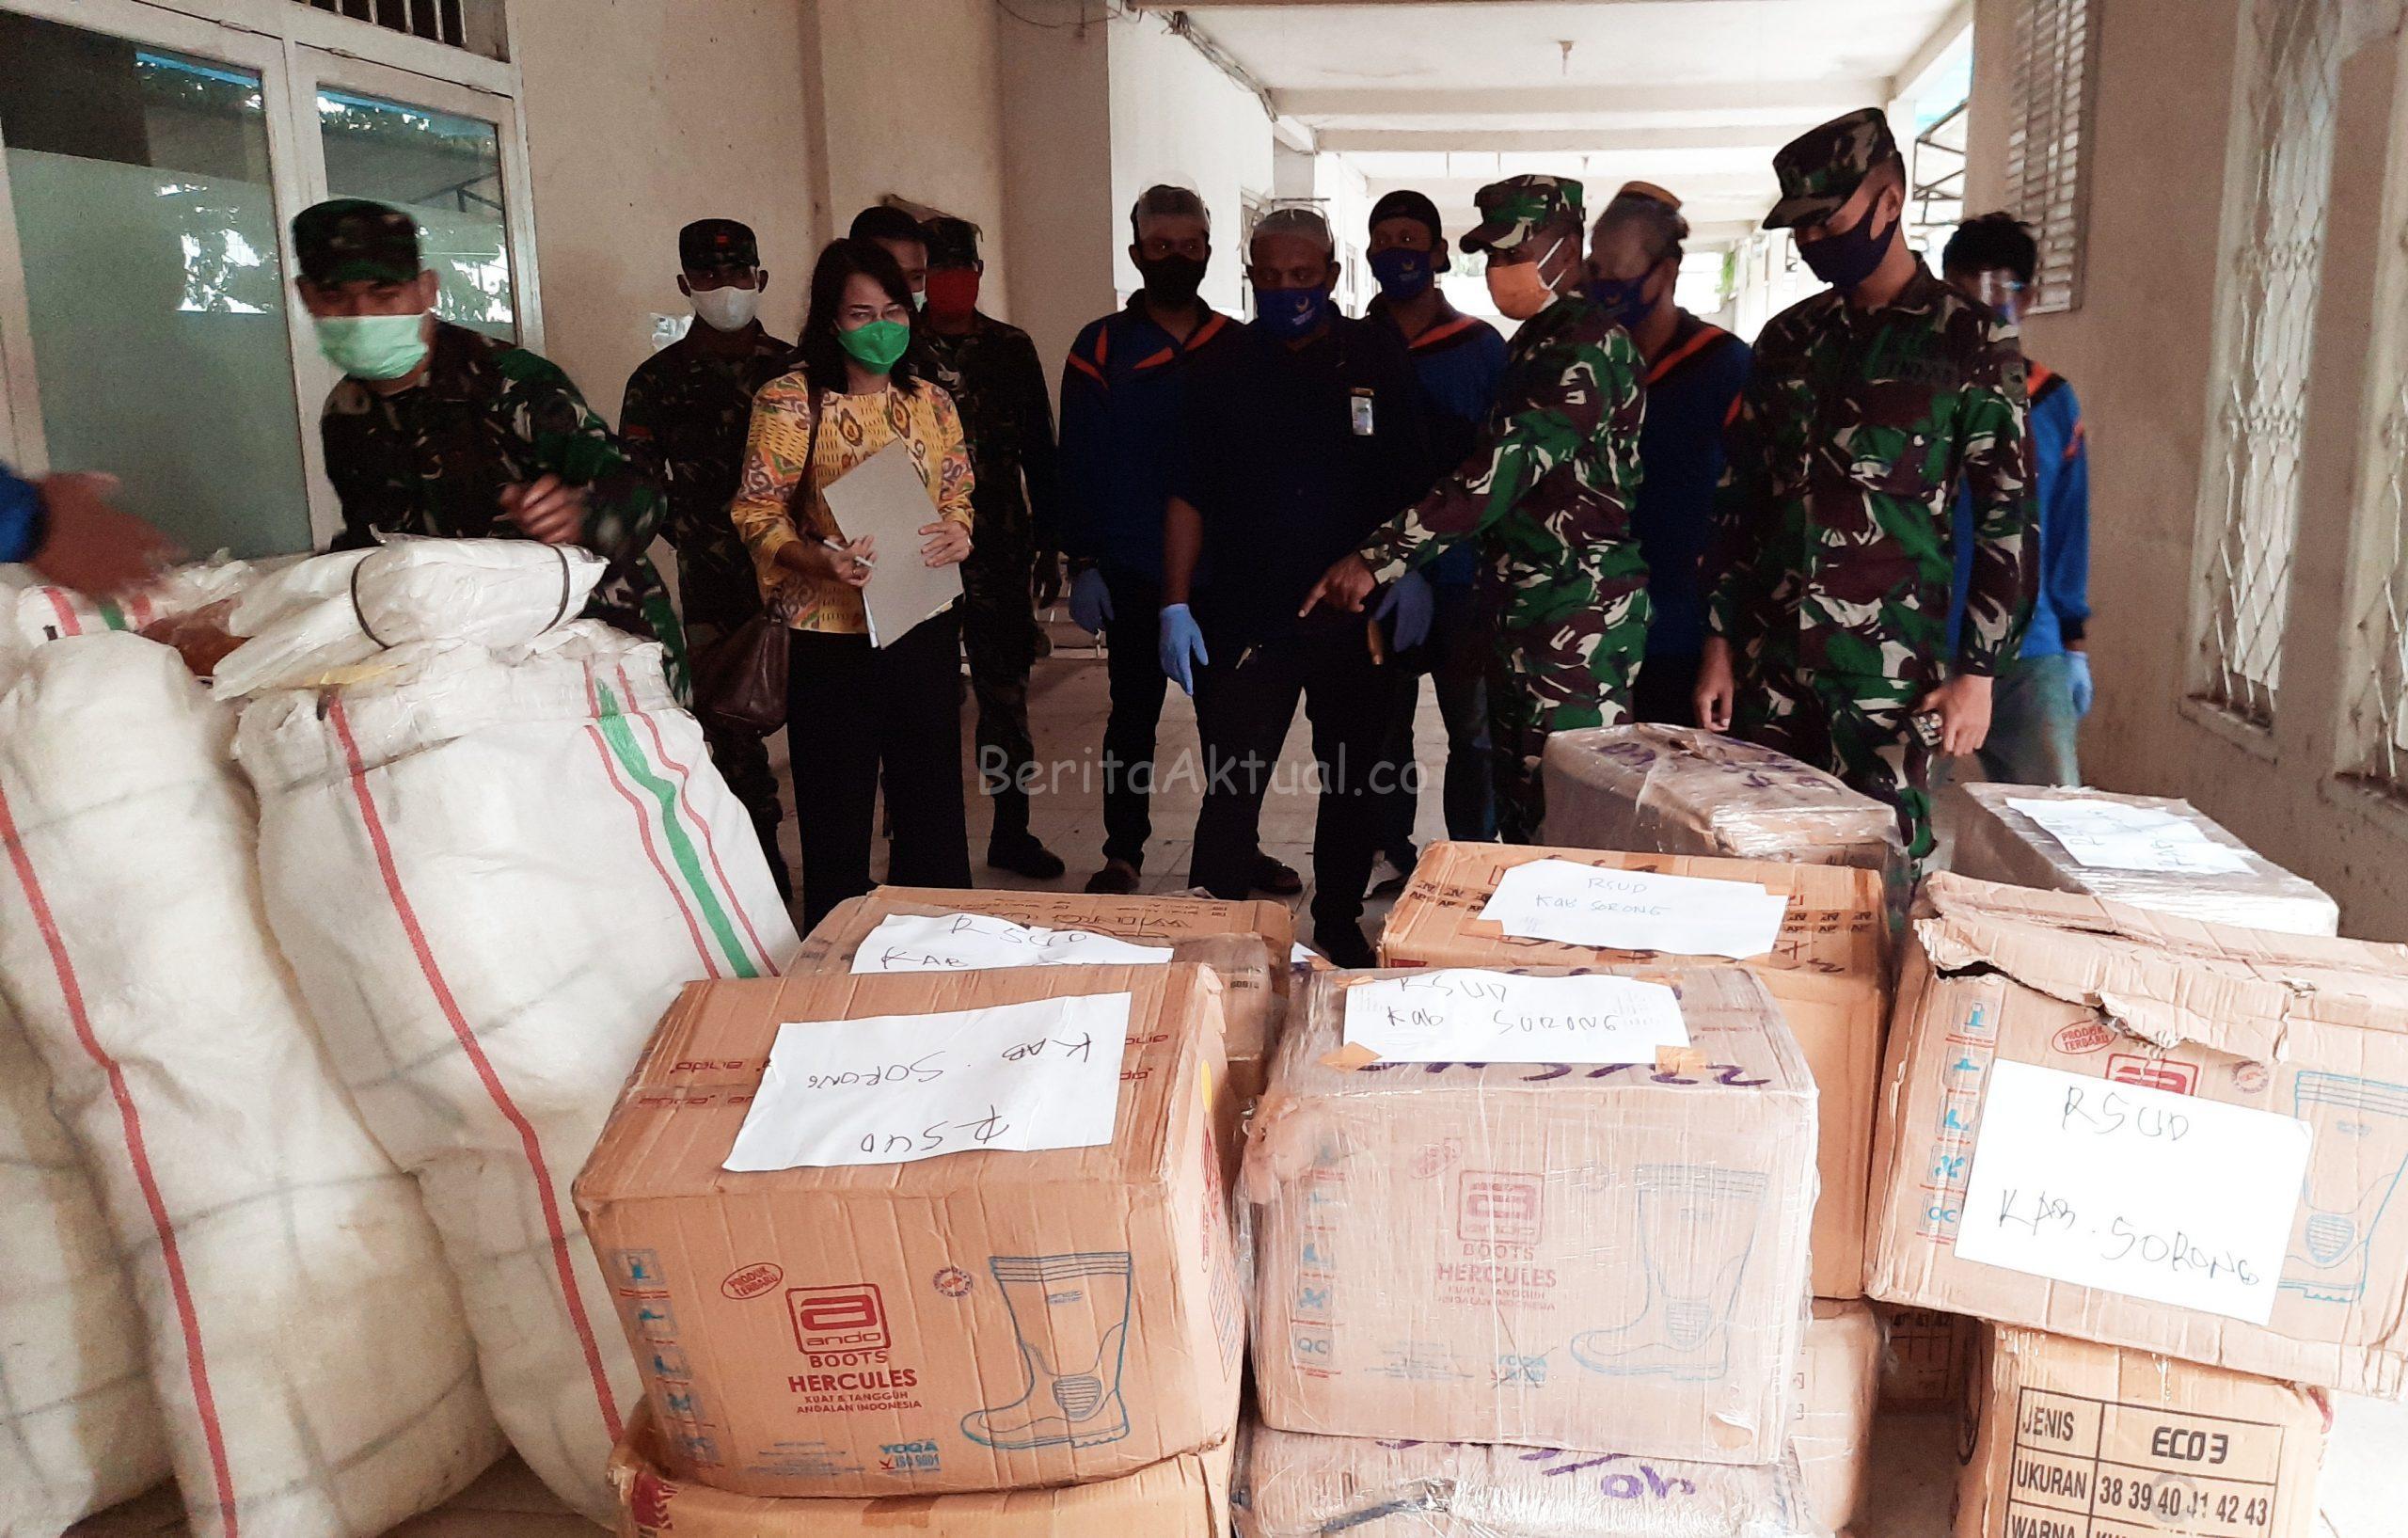 Rico Sia Salurkan Ribuan APD ke Rumah Sakit Darurat Covid-19 Kota Sorong 2 20200704 101259 scaled